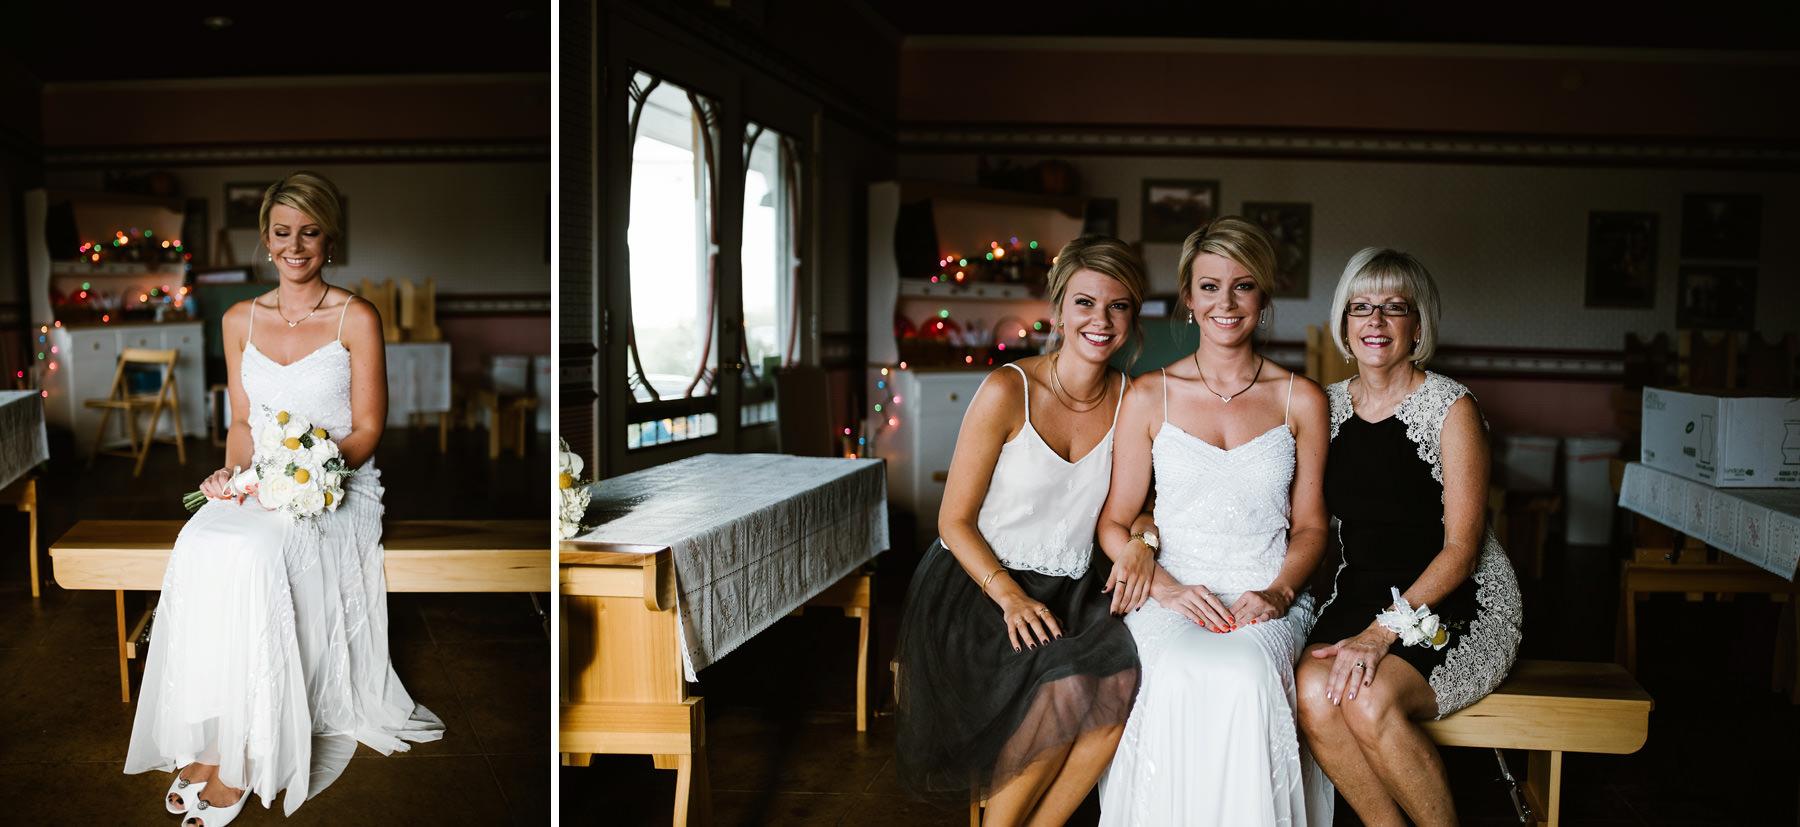 Alldredge Orchard Kansas City_Kindling Wedding Photography BLOG 29.JPG